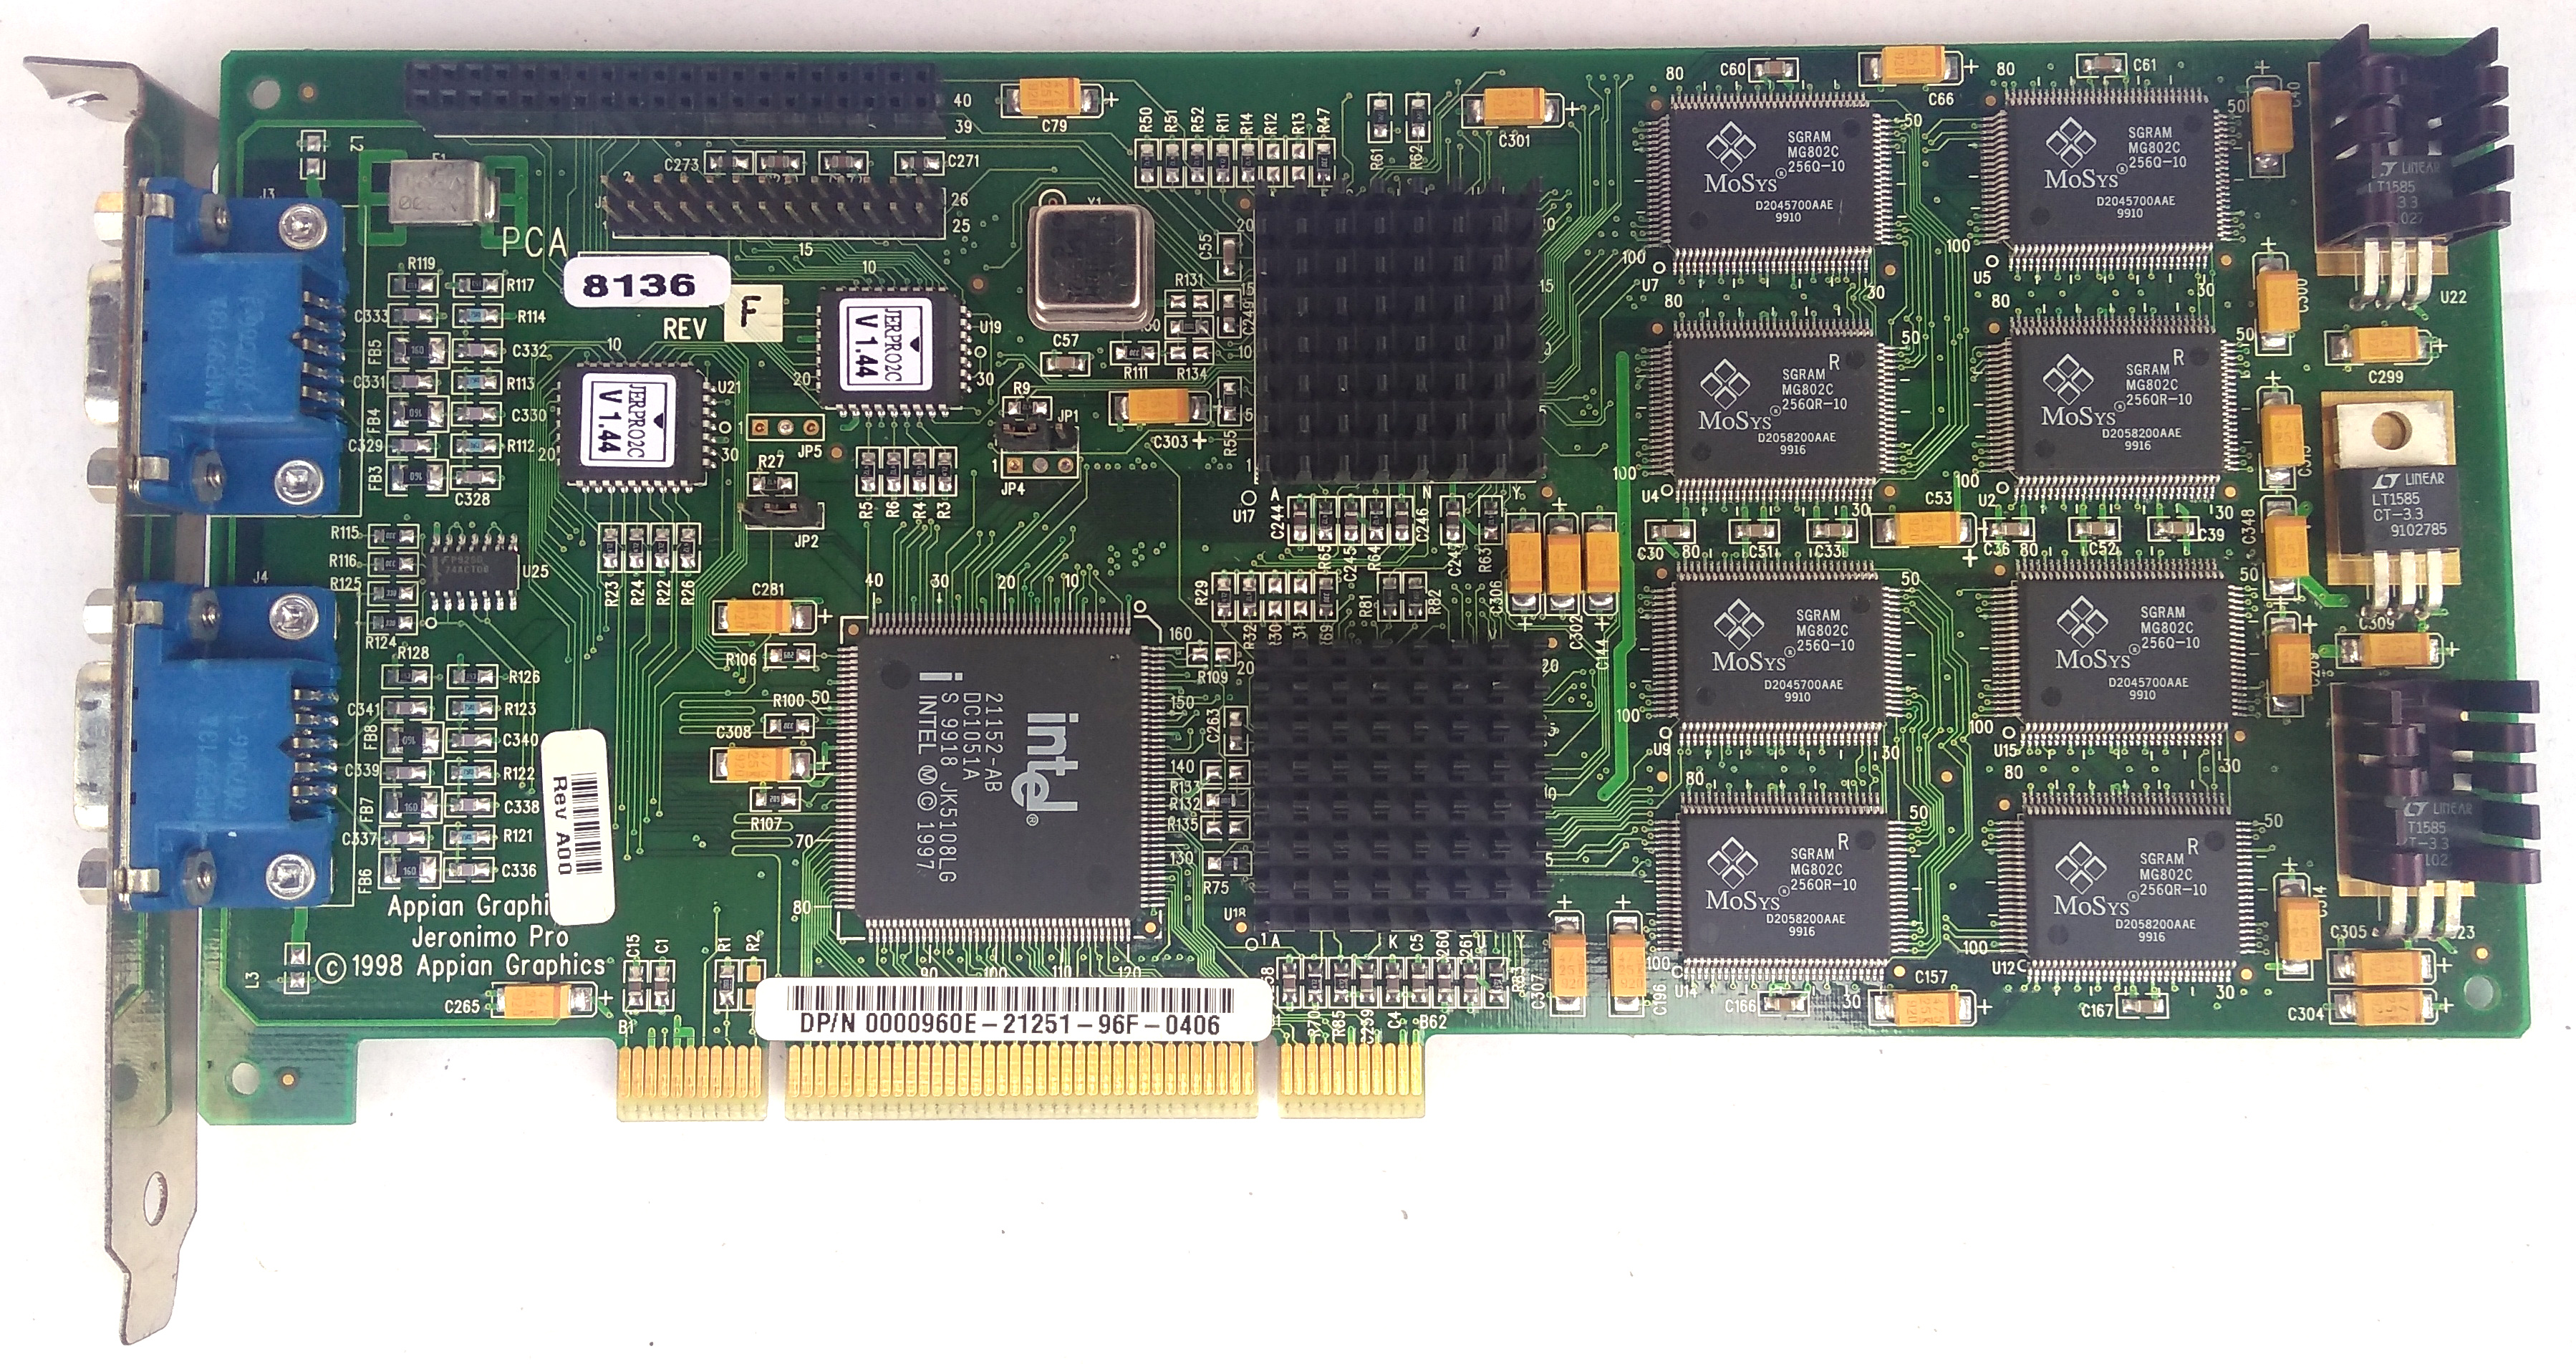 INTEL 21152-AB WINDOWS 7 X64 DRIVER